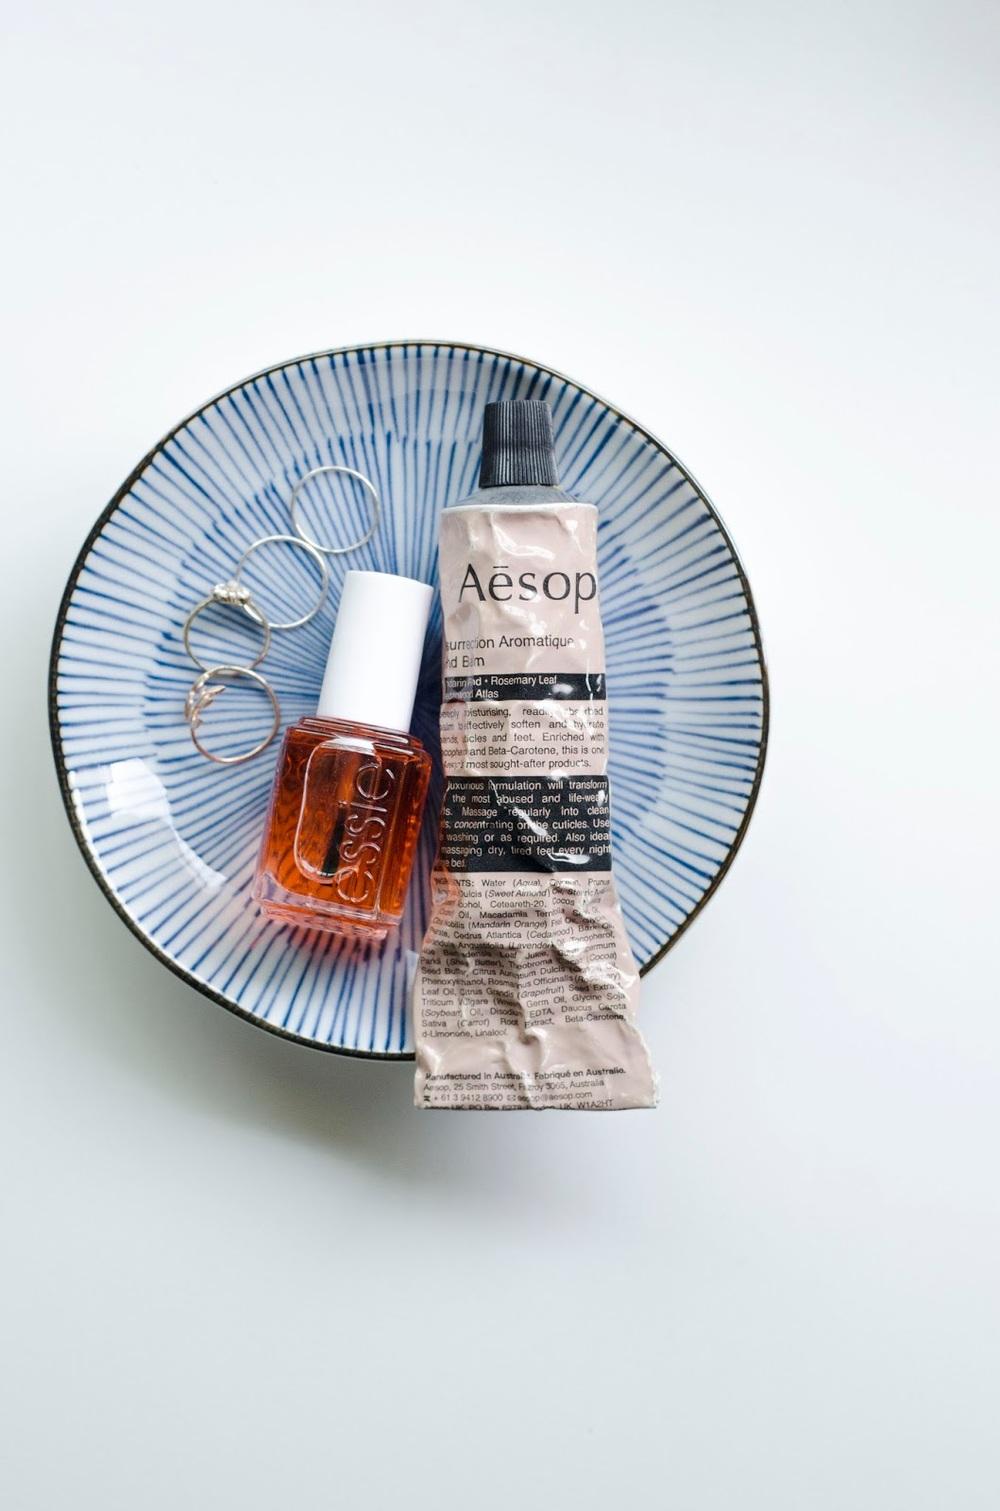 Essie Apricot Oil, Aesop, Aesop Resurrection Balm